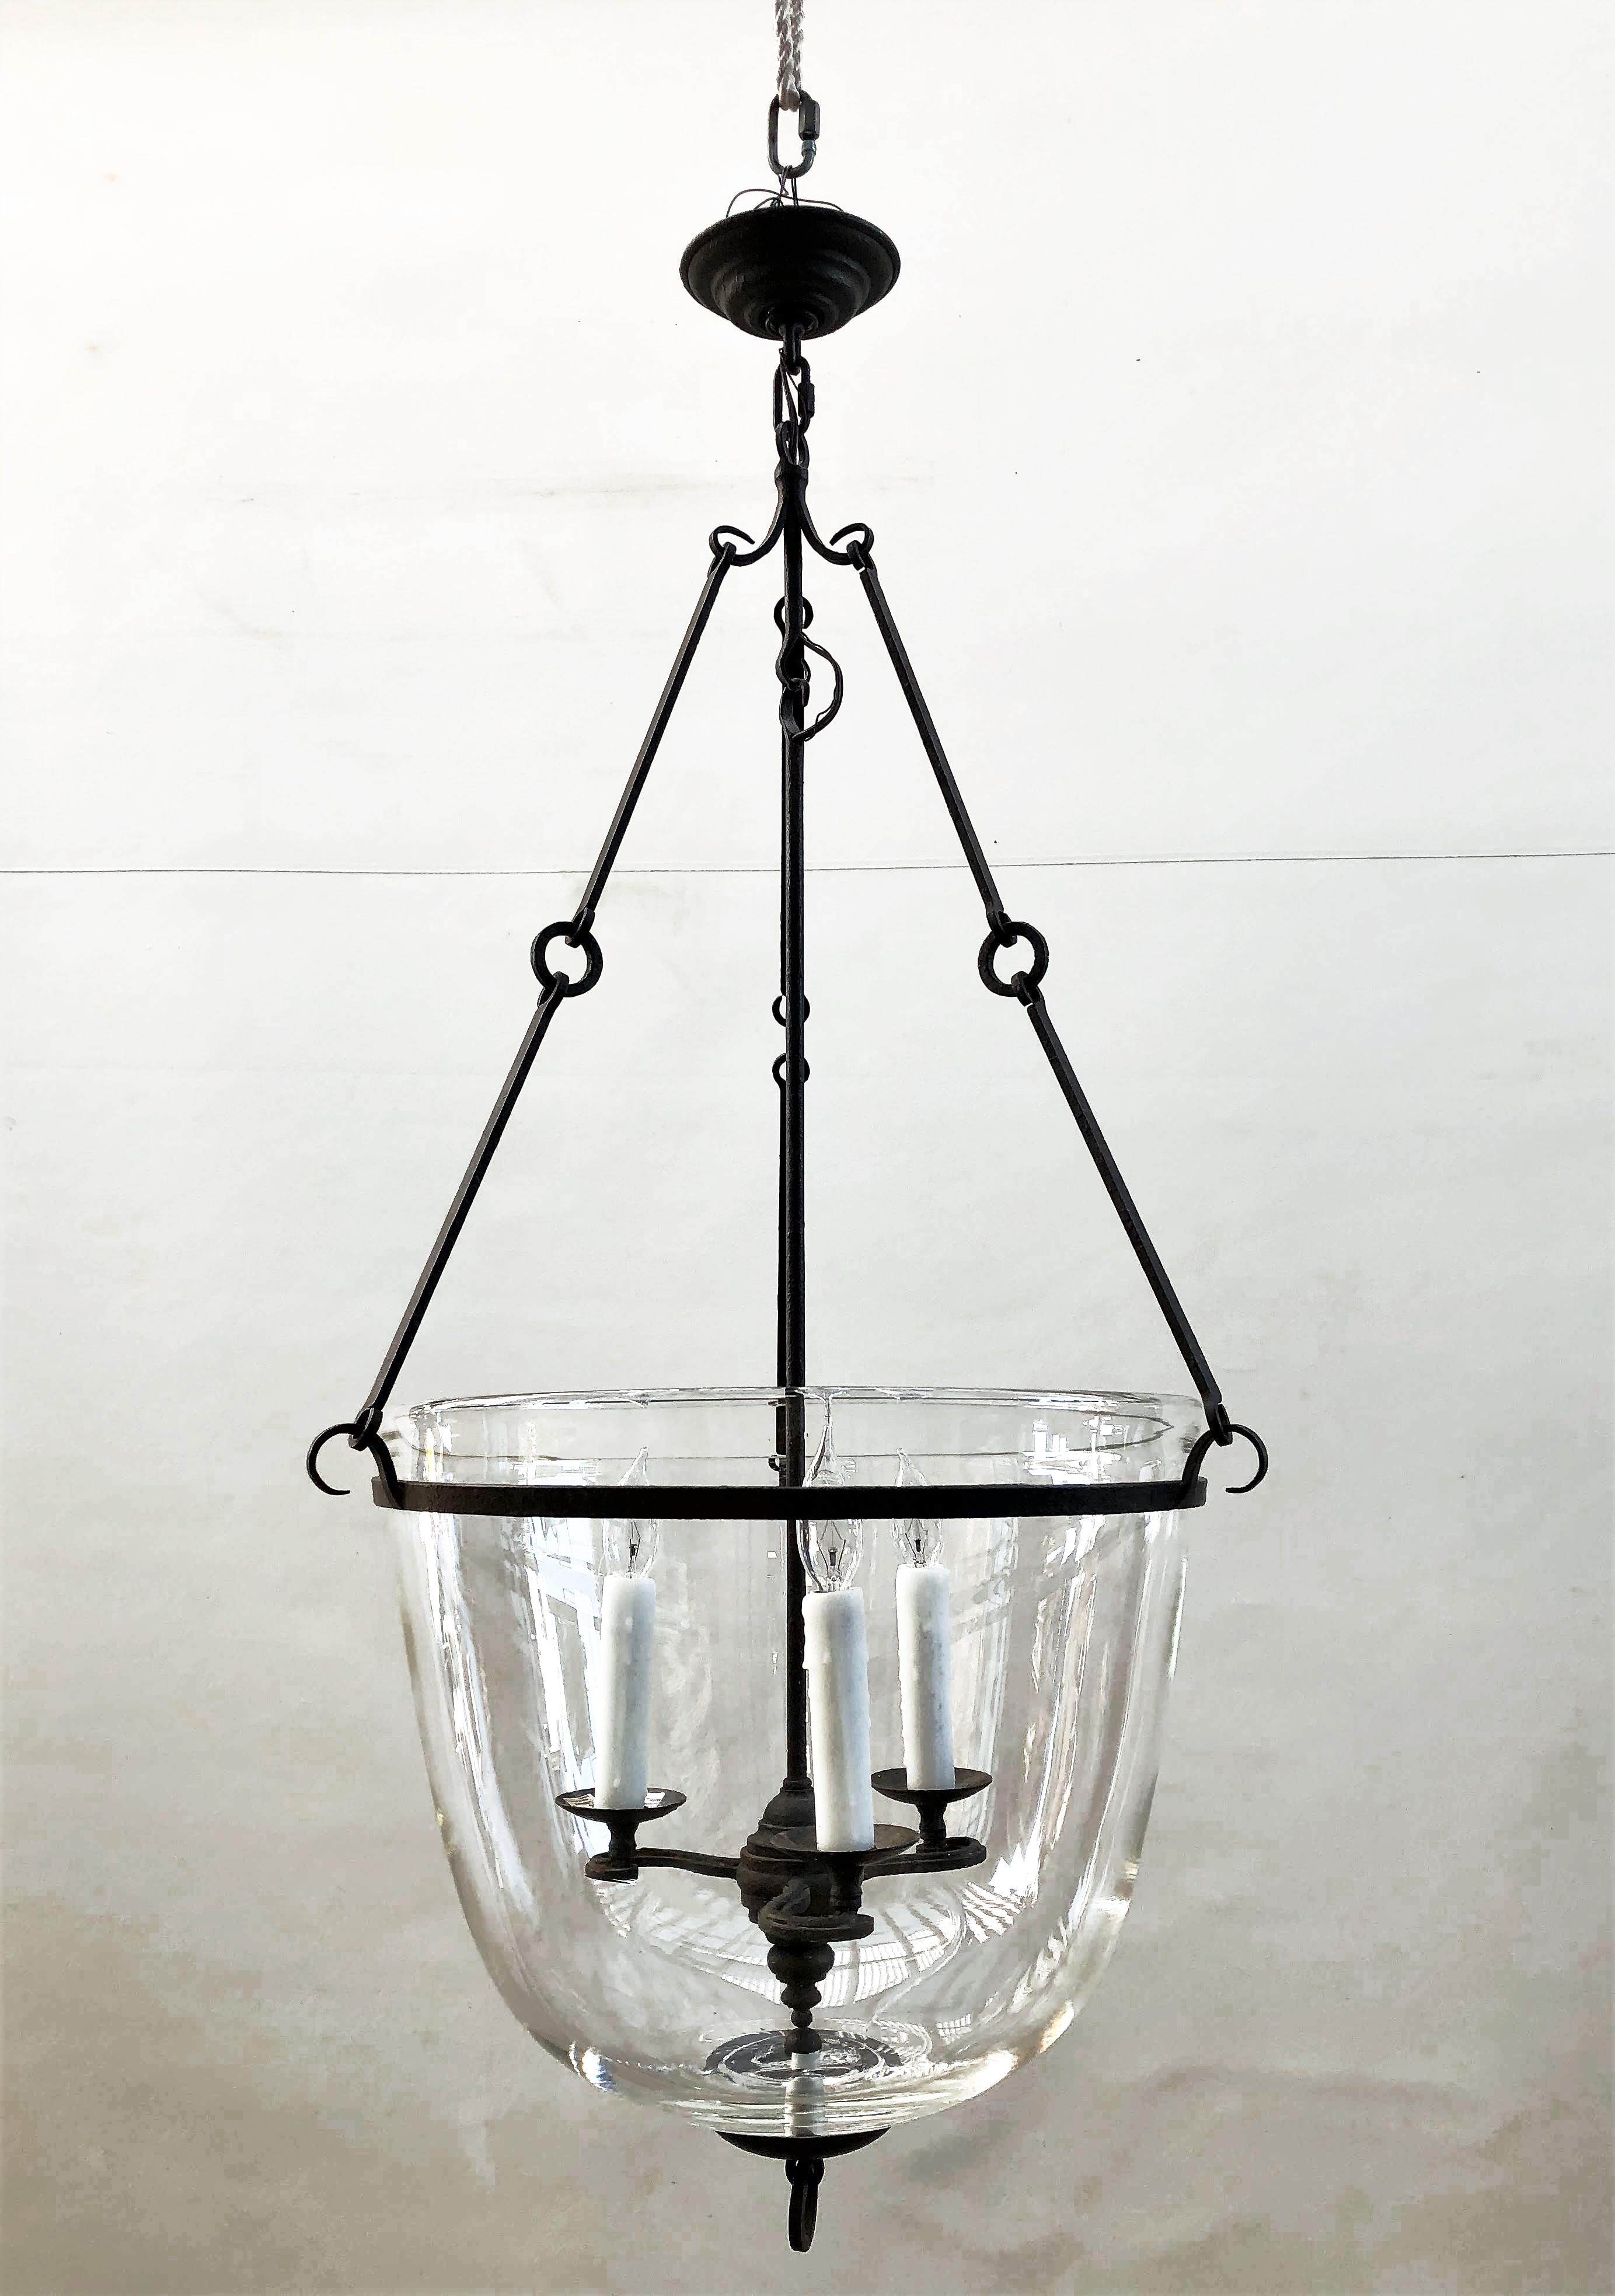 Wrought Iron Large Gl Bell Jar Hanging Light Fixture 26